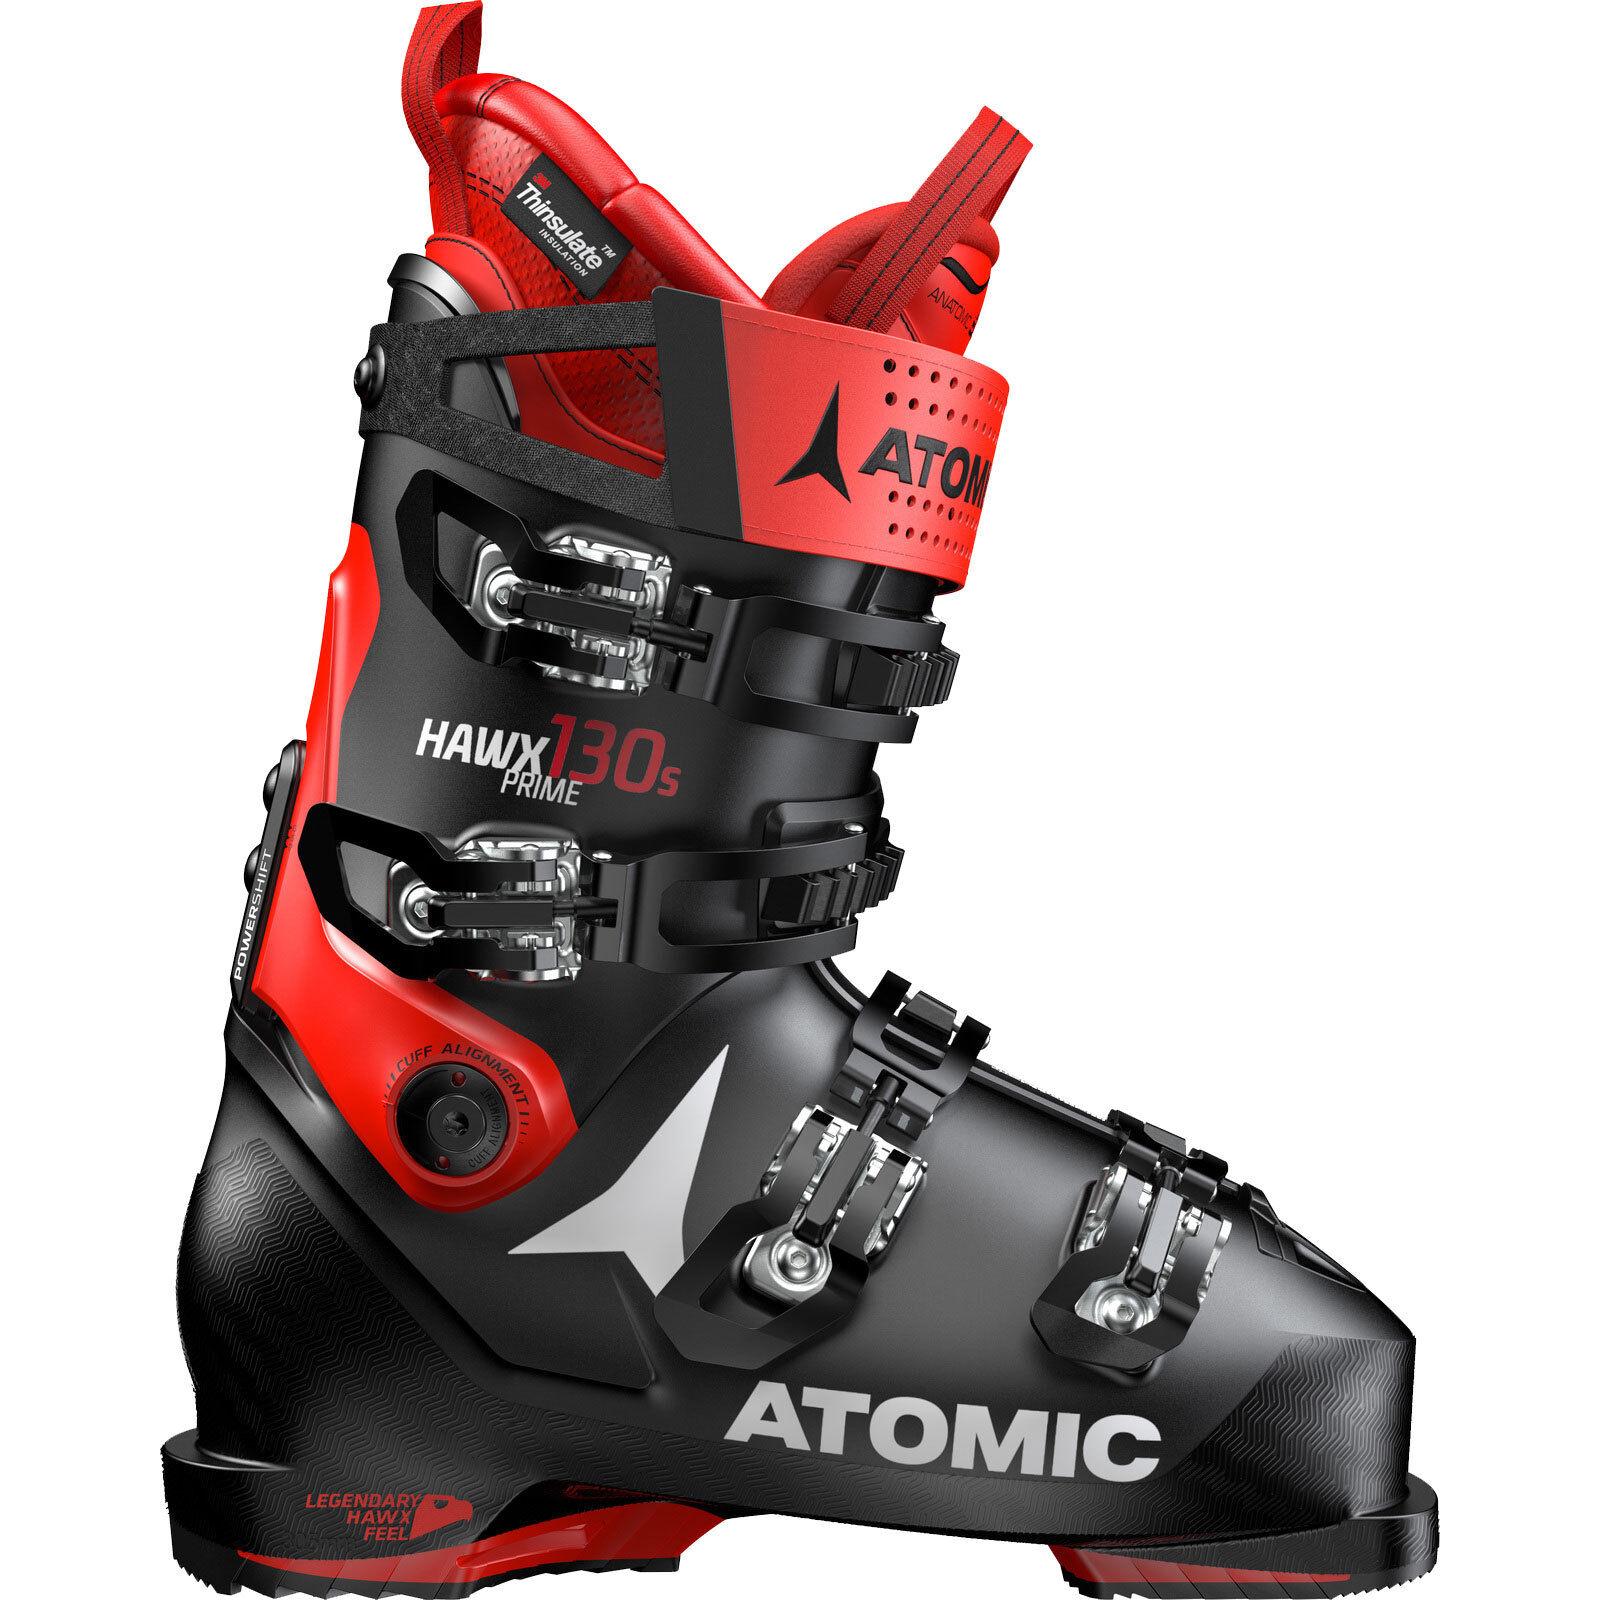 Atomic Hawx Prime 130 S Herren-SkiStiefel Skistiefel Ski Ski Ski Schuhe Skischuhe Stiefel 68ca42